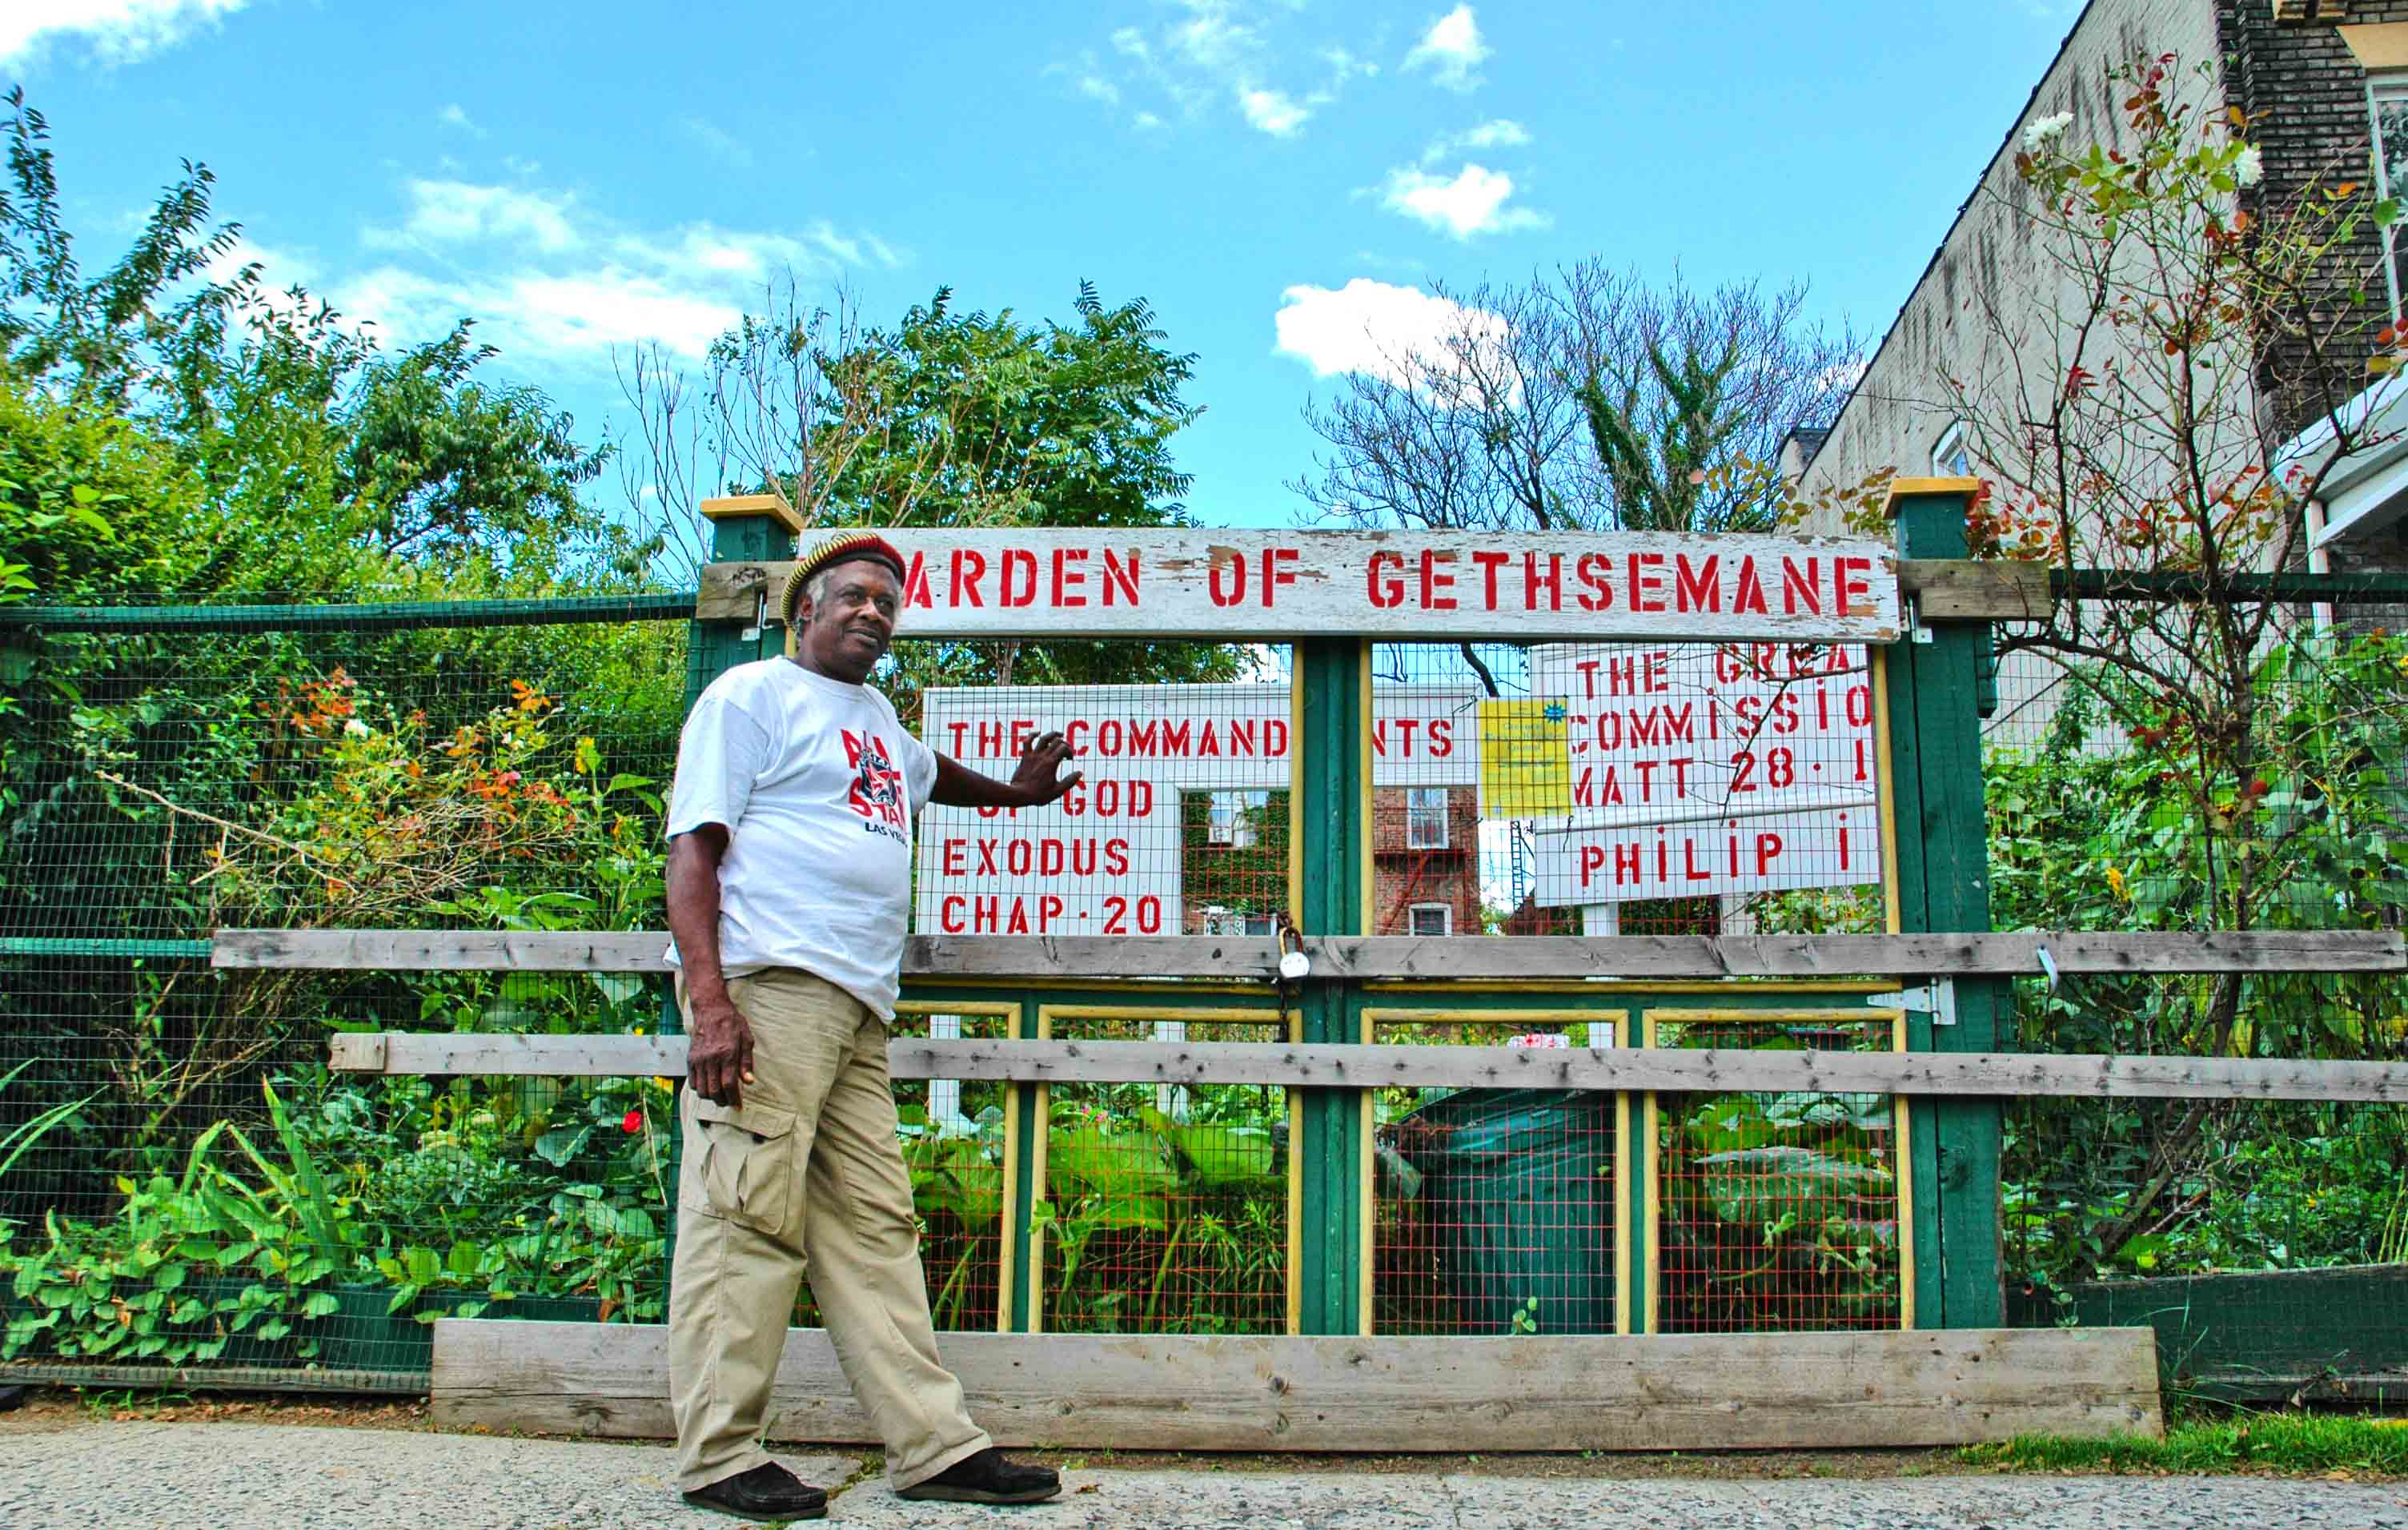 The Garden Of Gethsemane In Ocean Hill Brownsville, Brooklyn. Series: God In